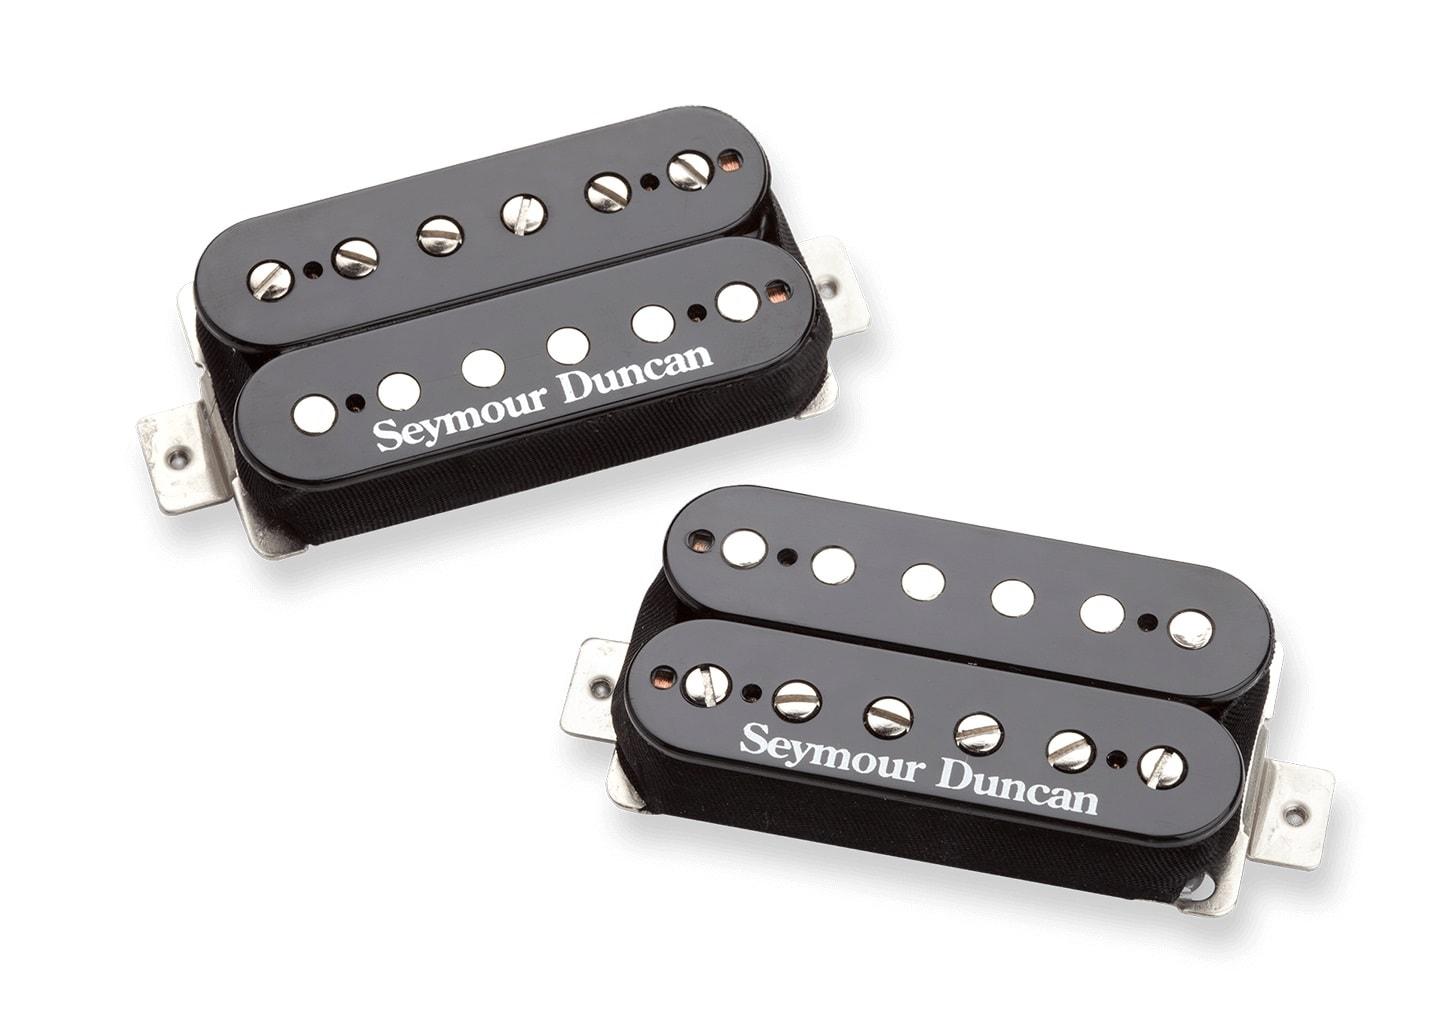 seymour duncan black winter humbucker pickup set solo guitars. Black Bedroom Furniture Sets. Home Design Ideas